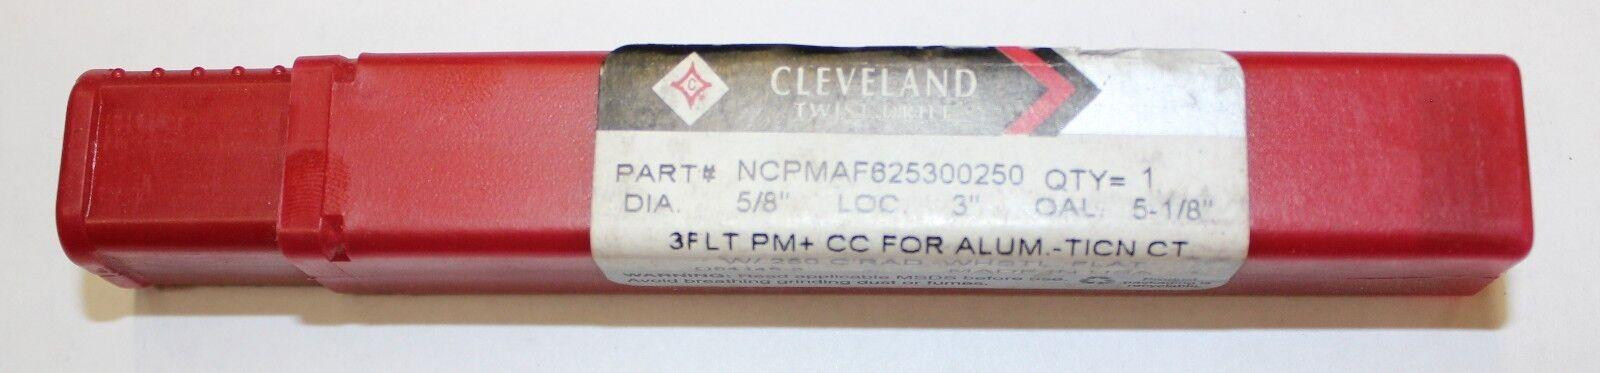 "3.5/"" OAL x 1-1//2/"" LOC w// .120 R 3//8/"" x 3 Fl Performer Carbide End Mill"